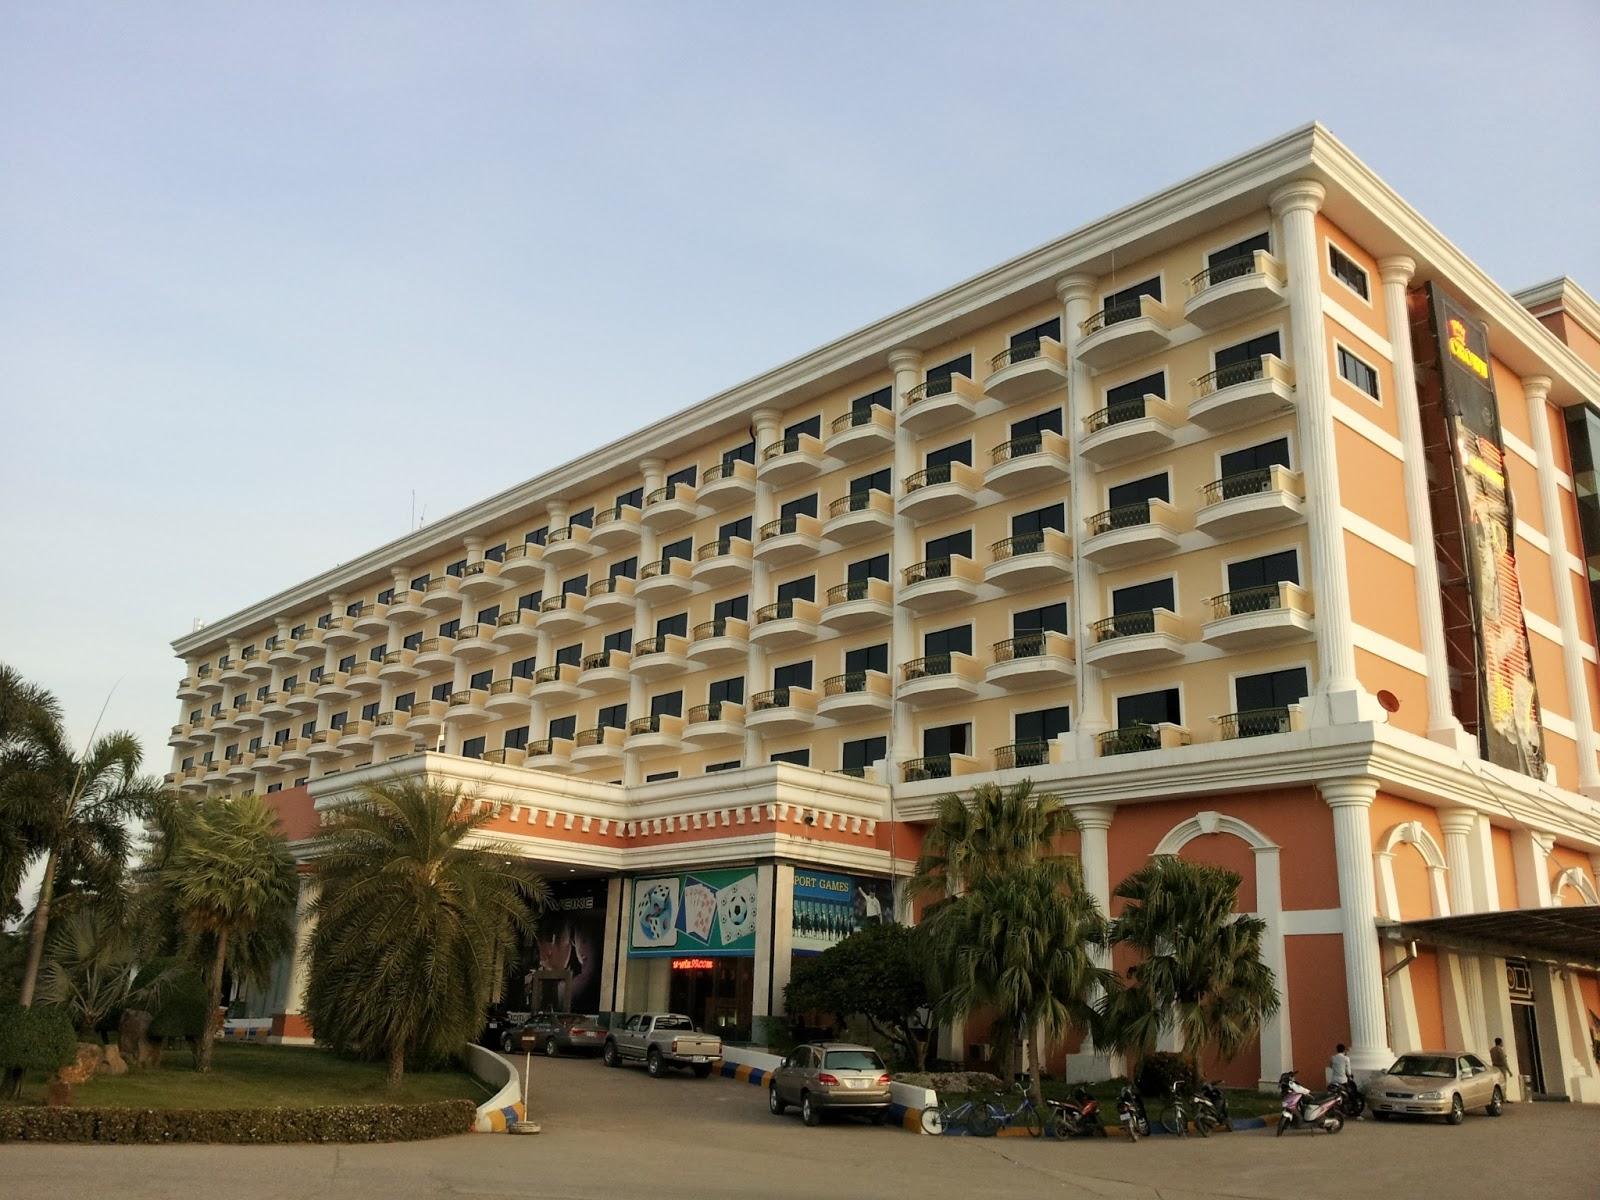 Genting Crown Casino & Hotel Poipet